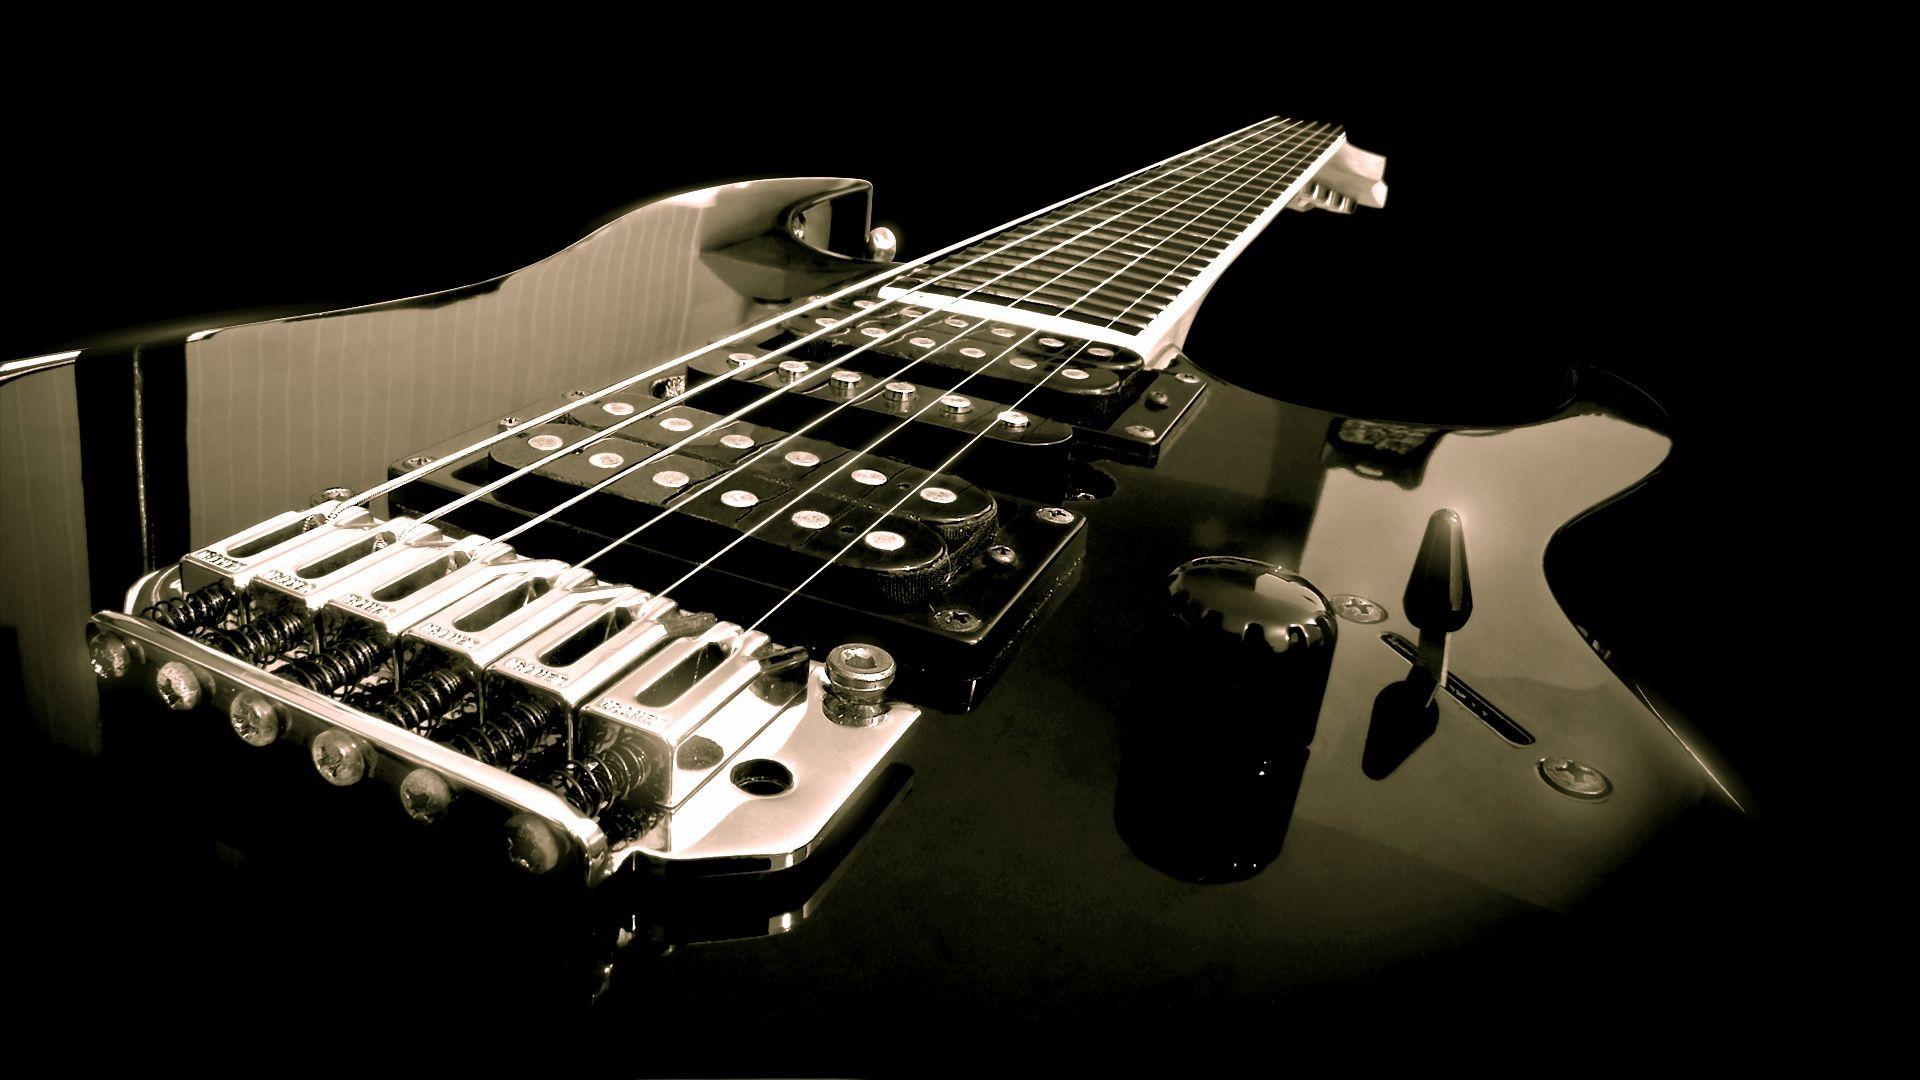 Fender Guitar, Cool HD Wallpaper